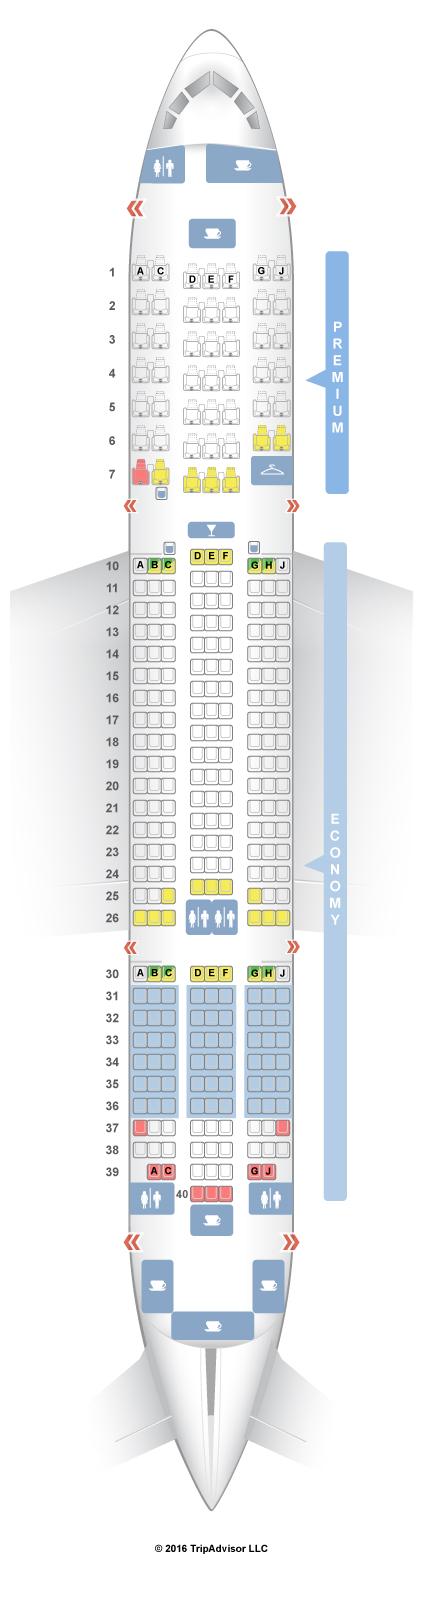 seatguru seat map thomson boeing 787 8 788